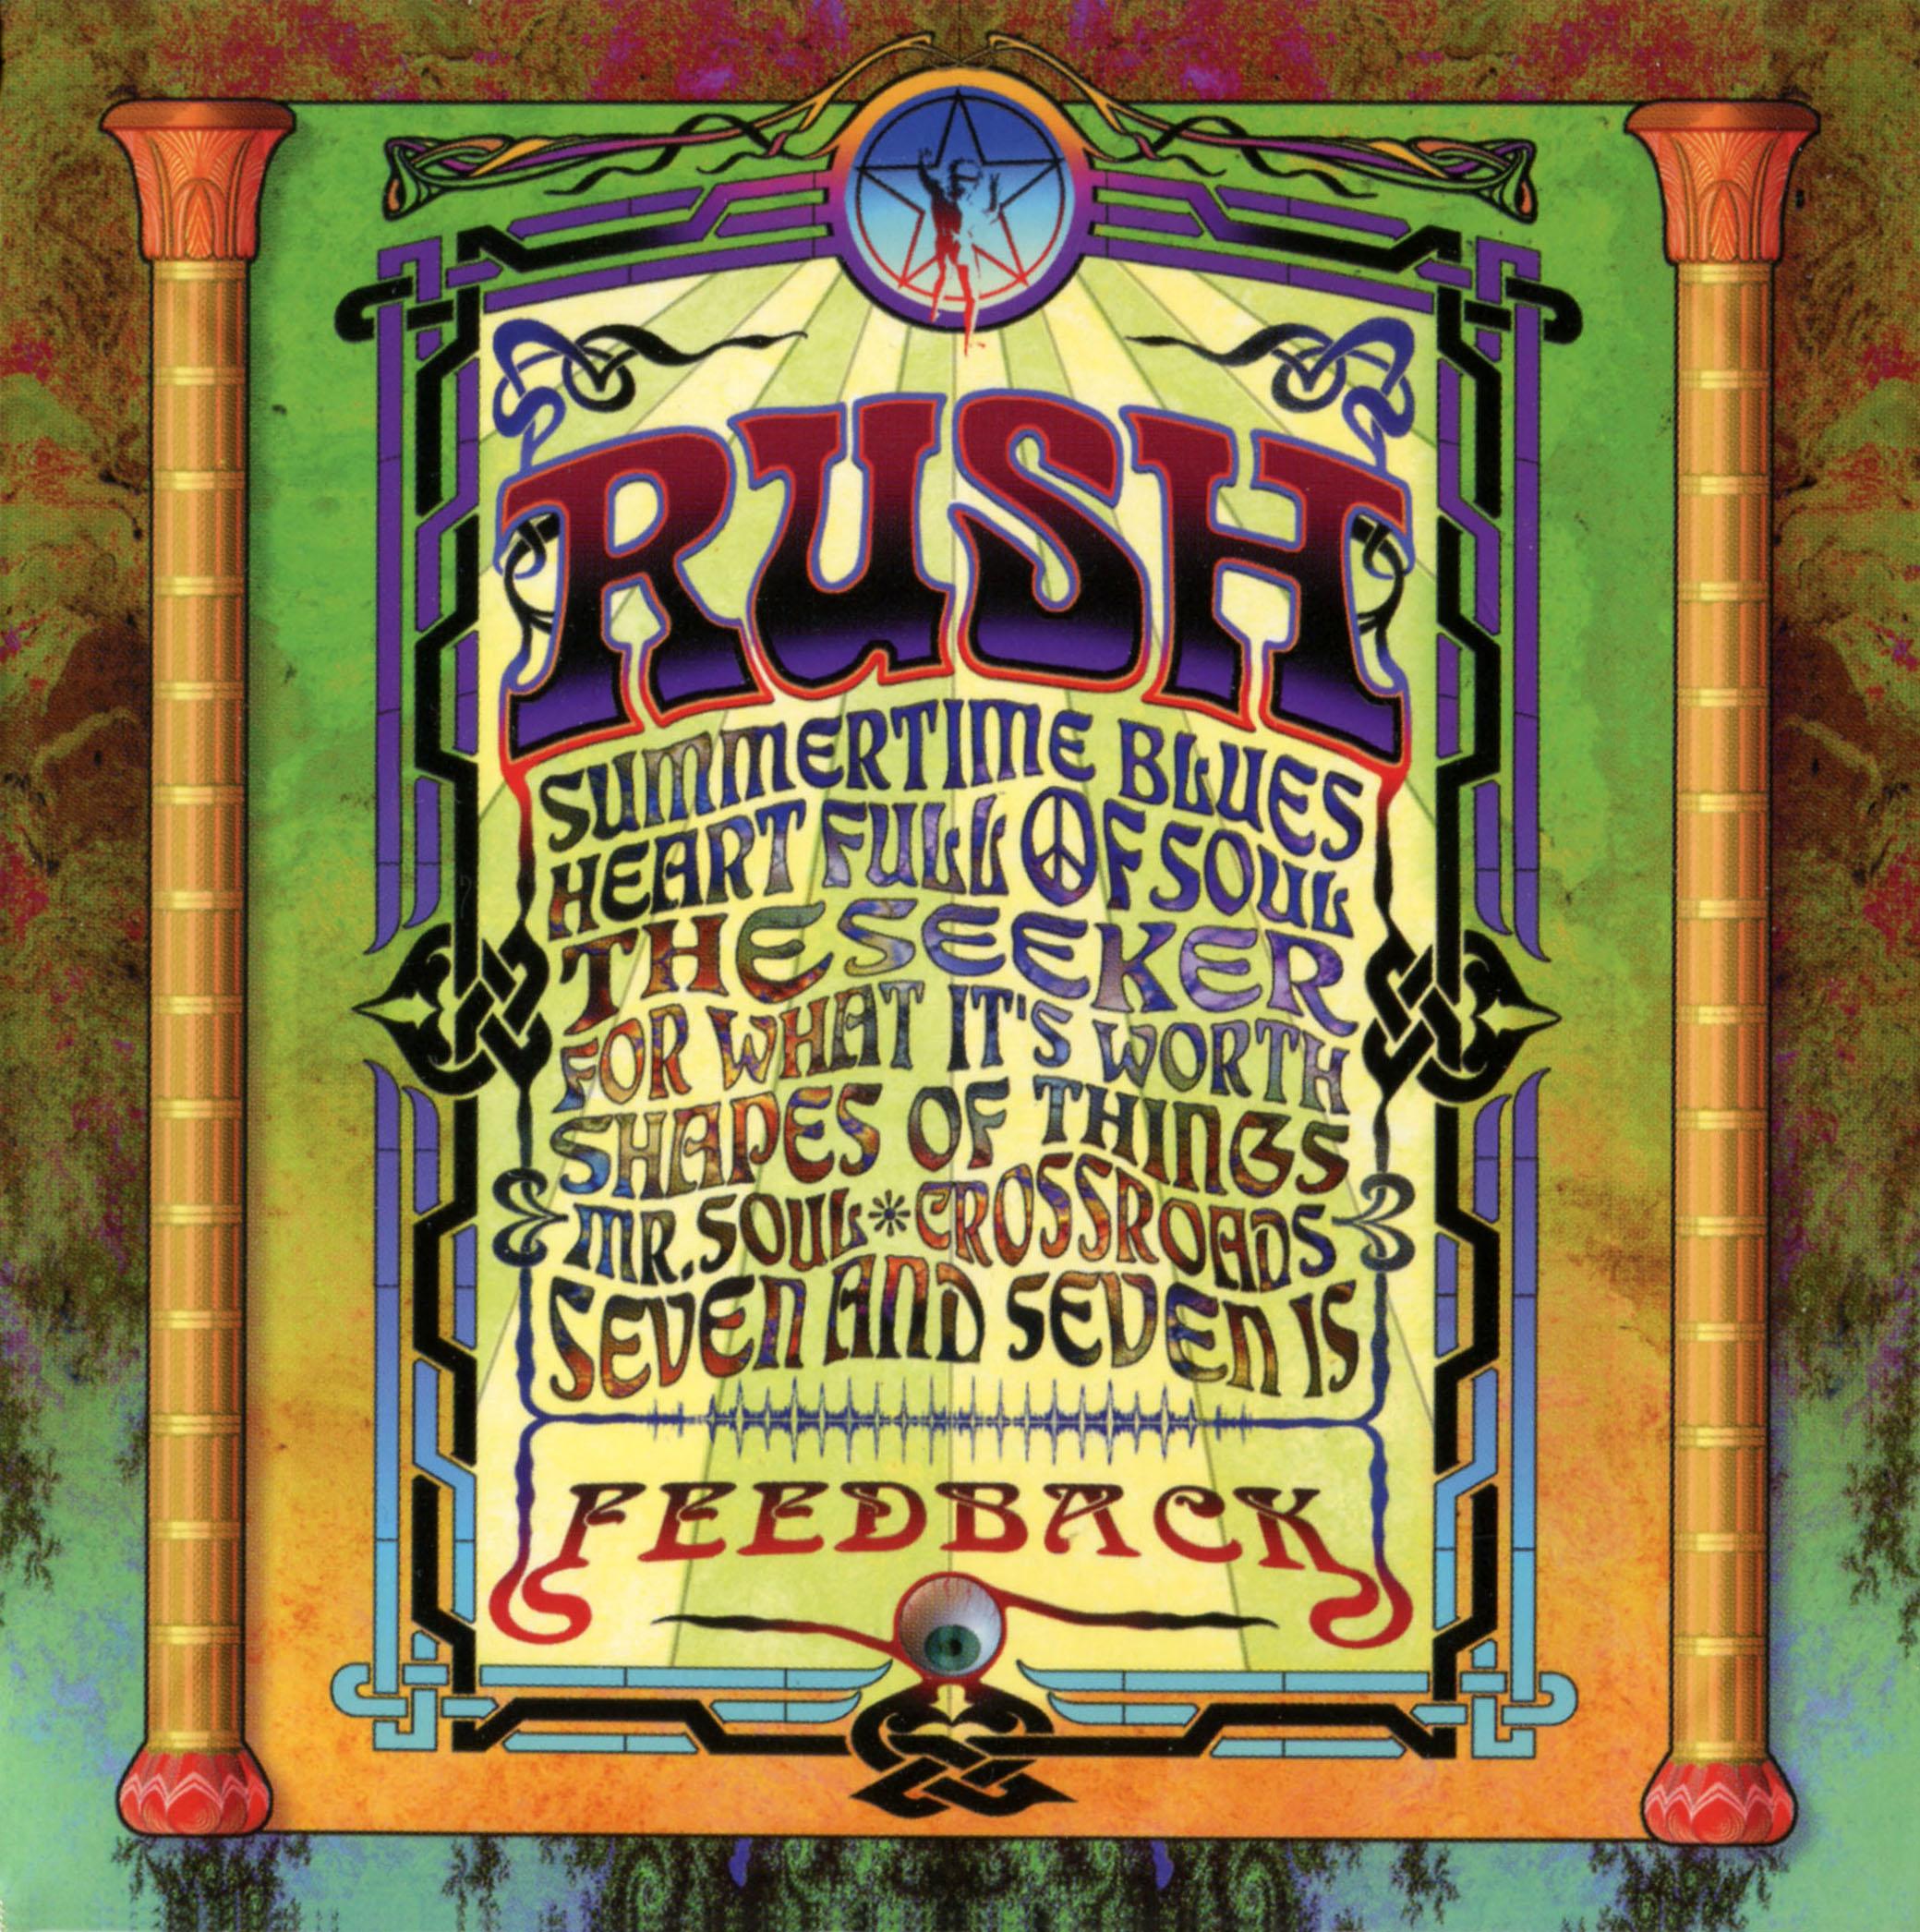 Rush feedback album artwork - Rush album covers ...